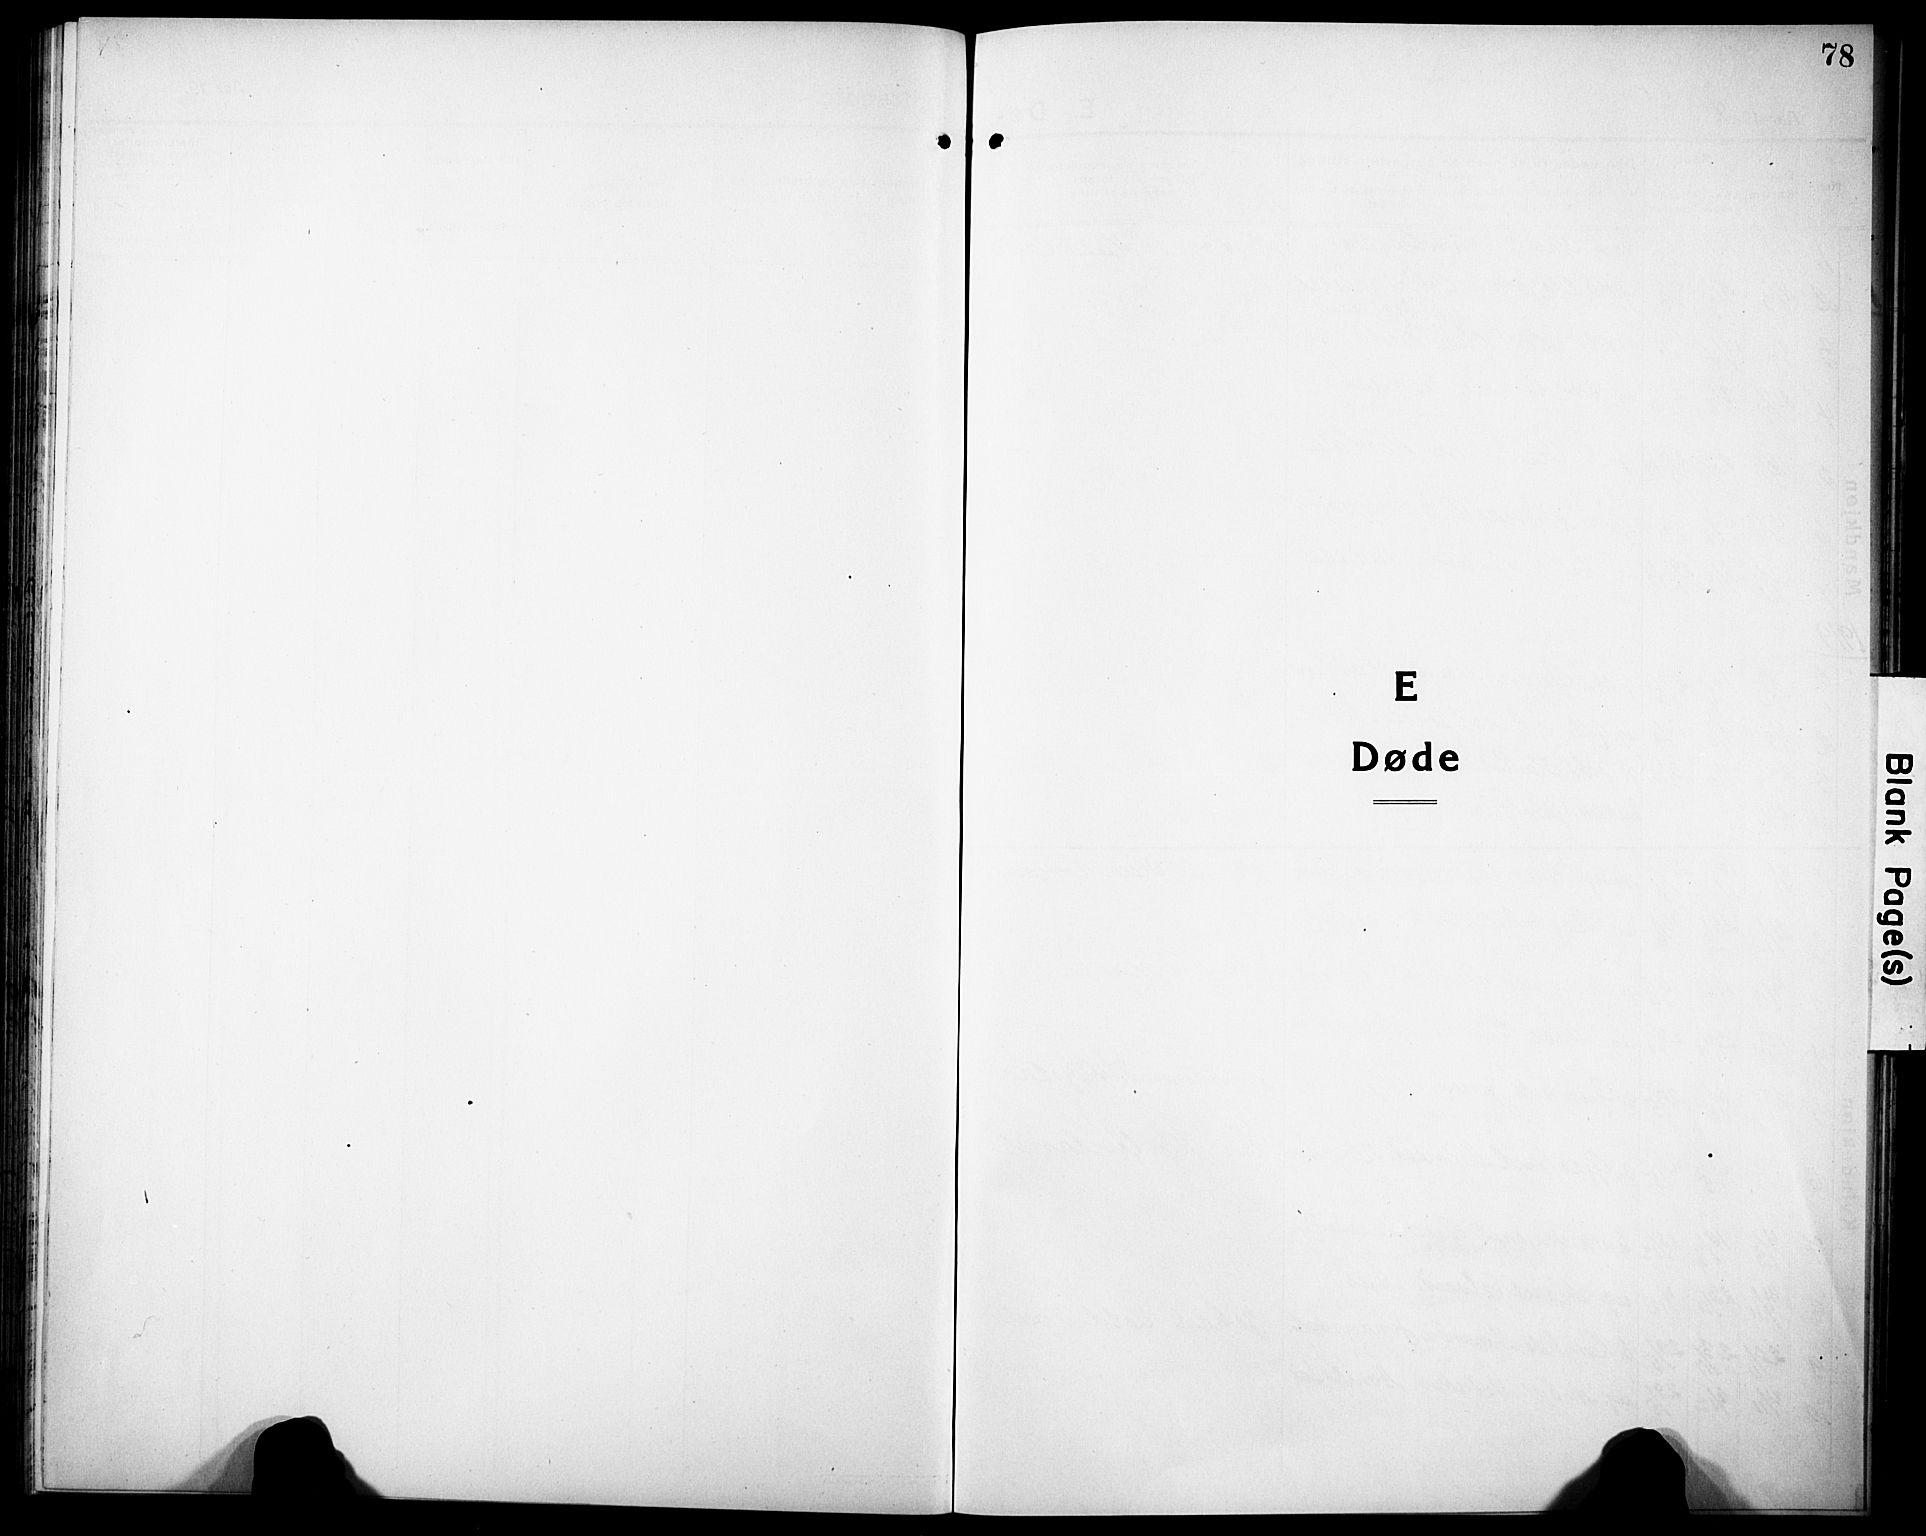 SAK, Herefoss sokneprestkontor, F/Fb/Fbb/L0004: Klokkerbok nr. B 4, 1917-1933, s. 78